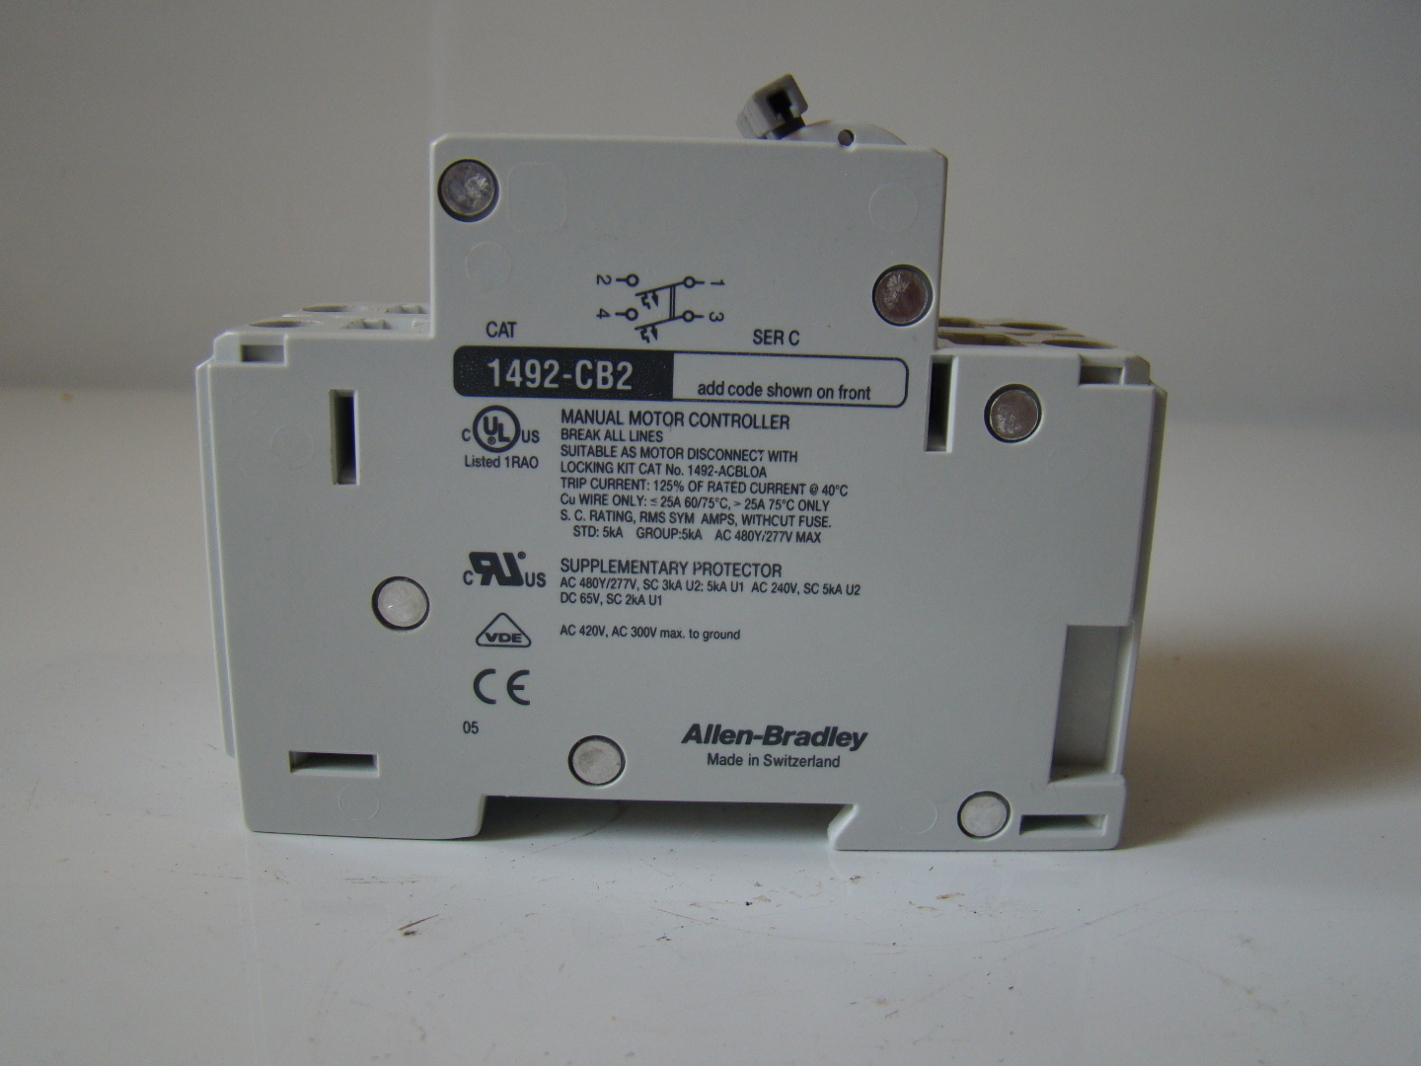 Allen Bradley Manual Motor Control 1492 Cb2g100 Joseph